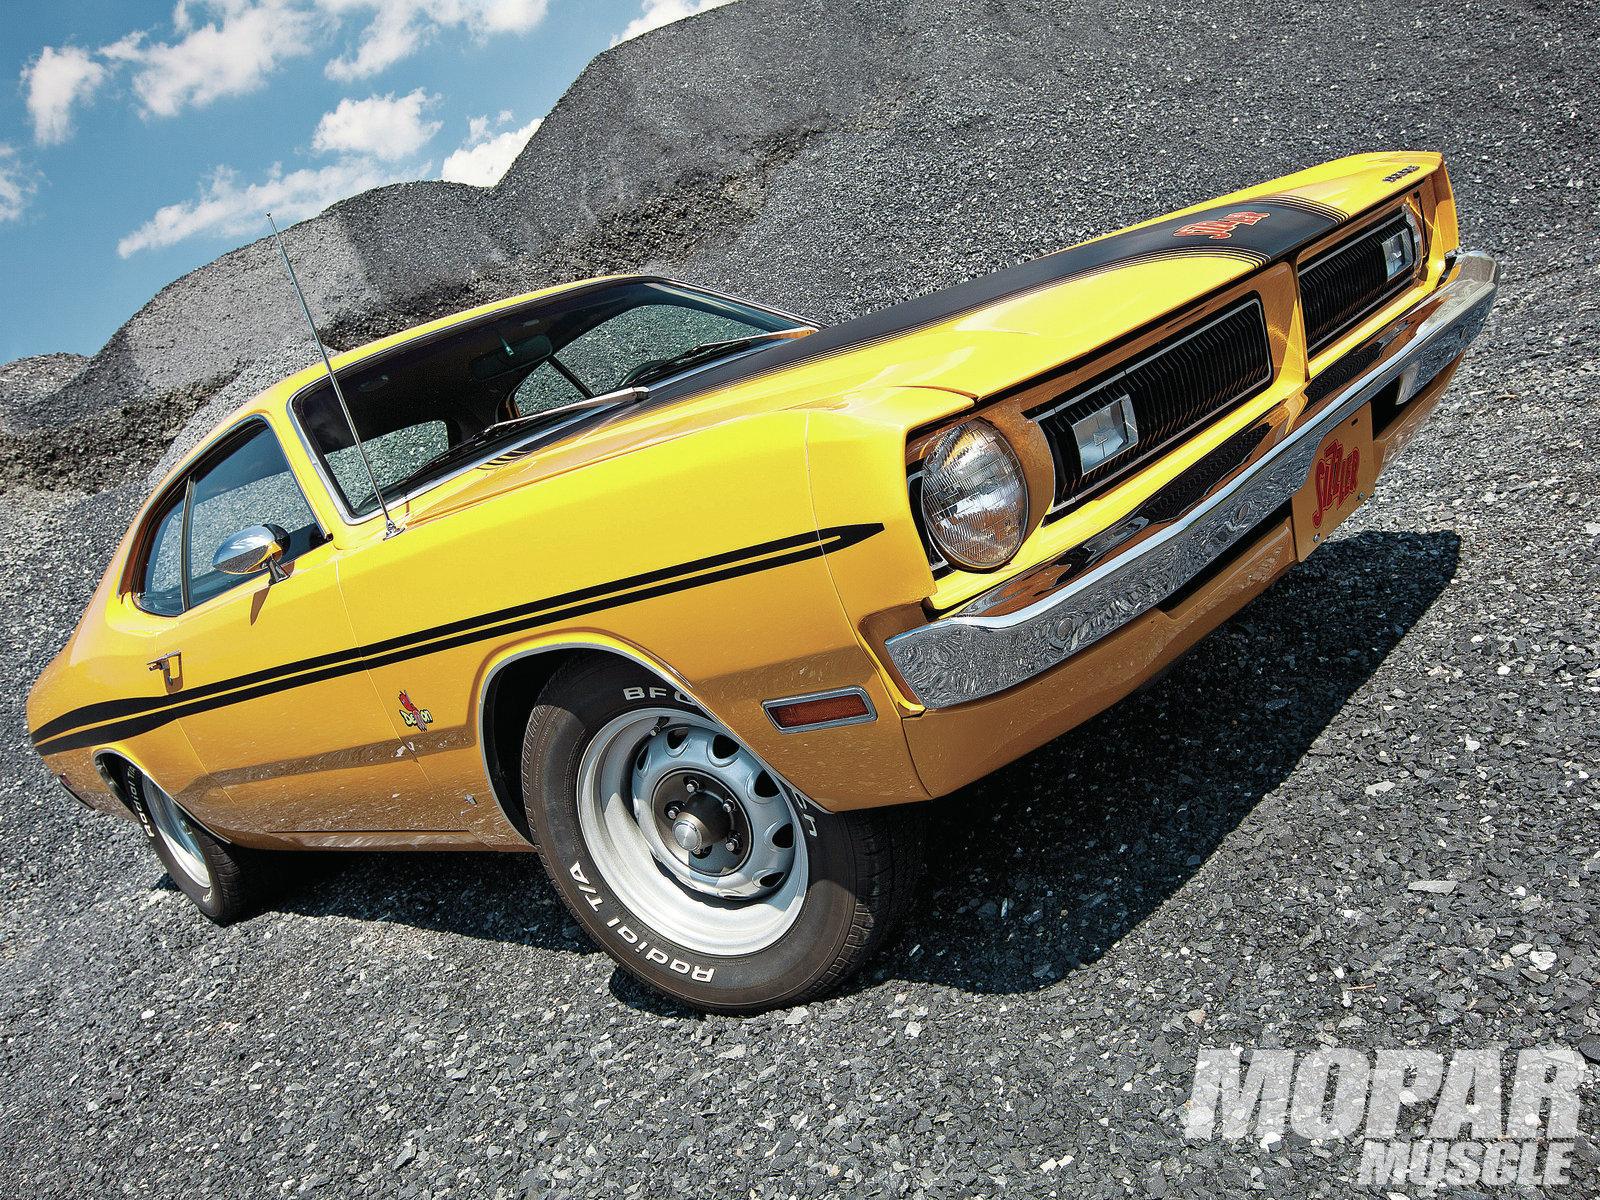 1971 Dodge Demon Hemi muscle cars wallpaper 1600x1200 34802 1600x1200